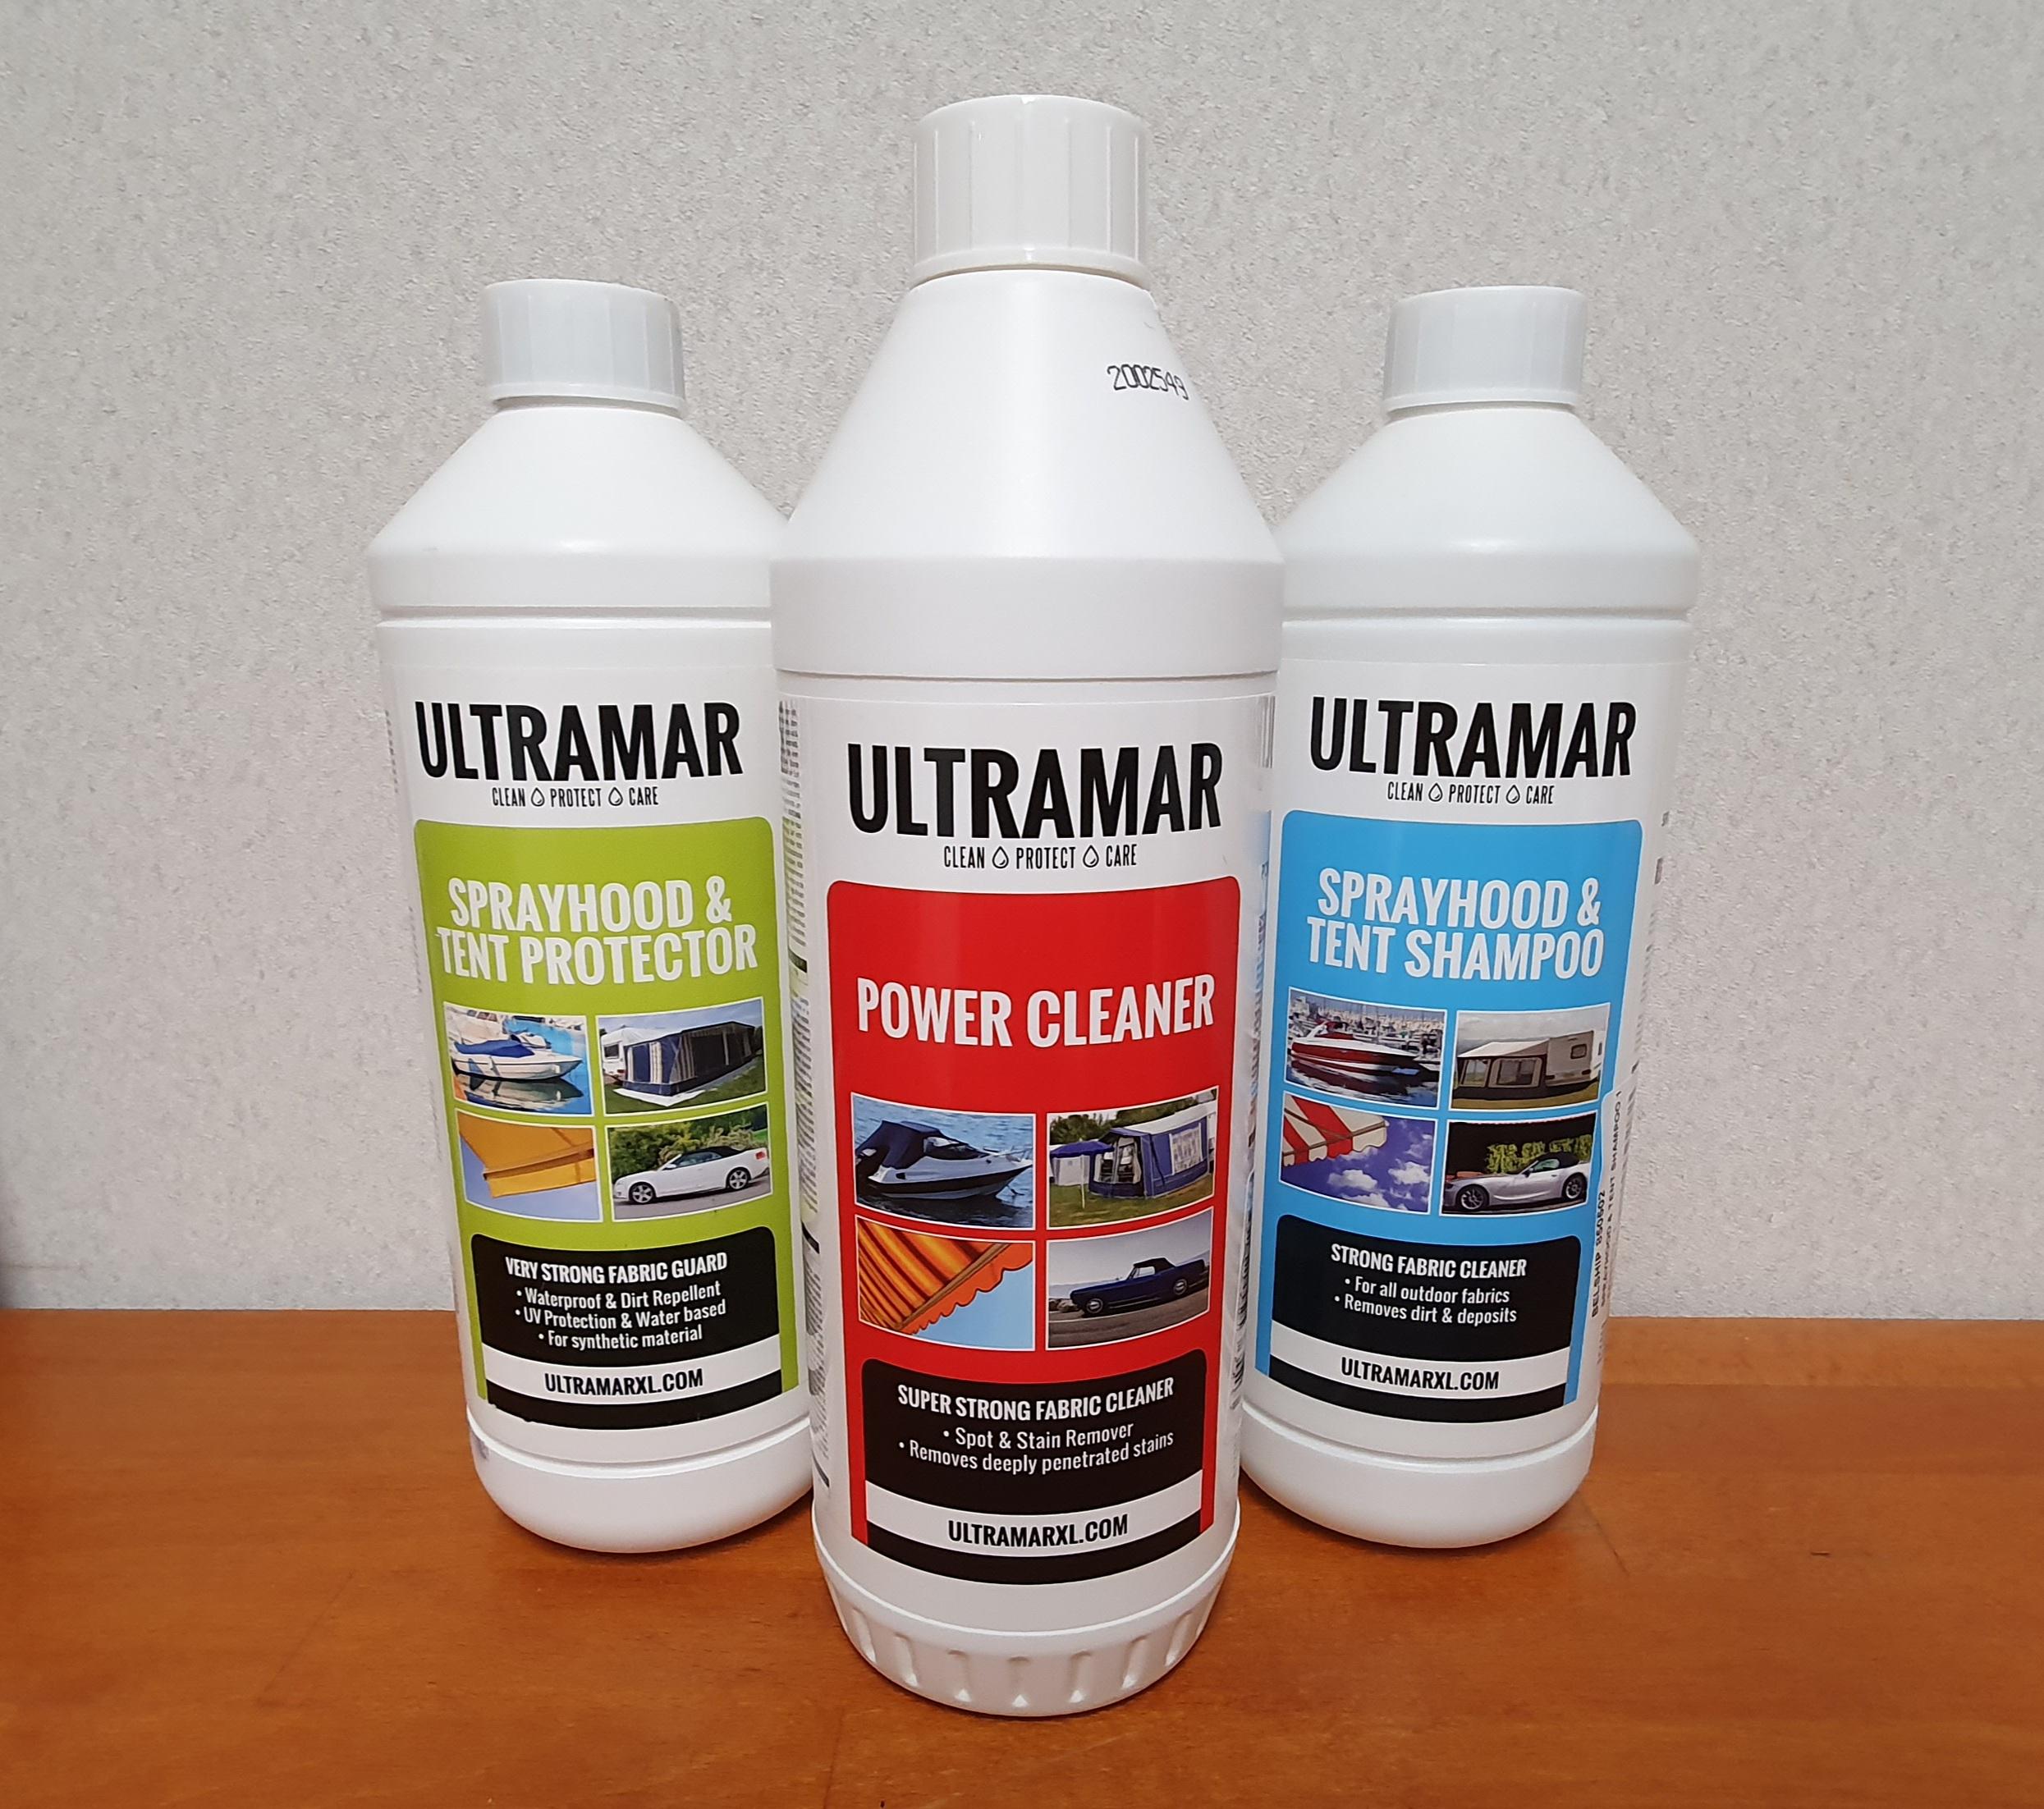 Ultramar producten